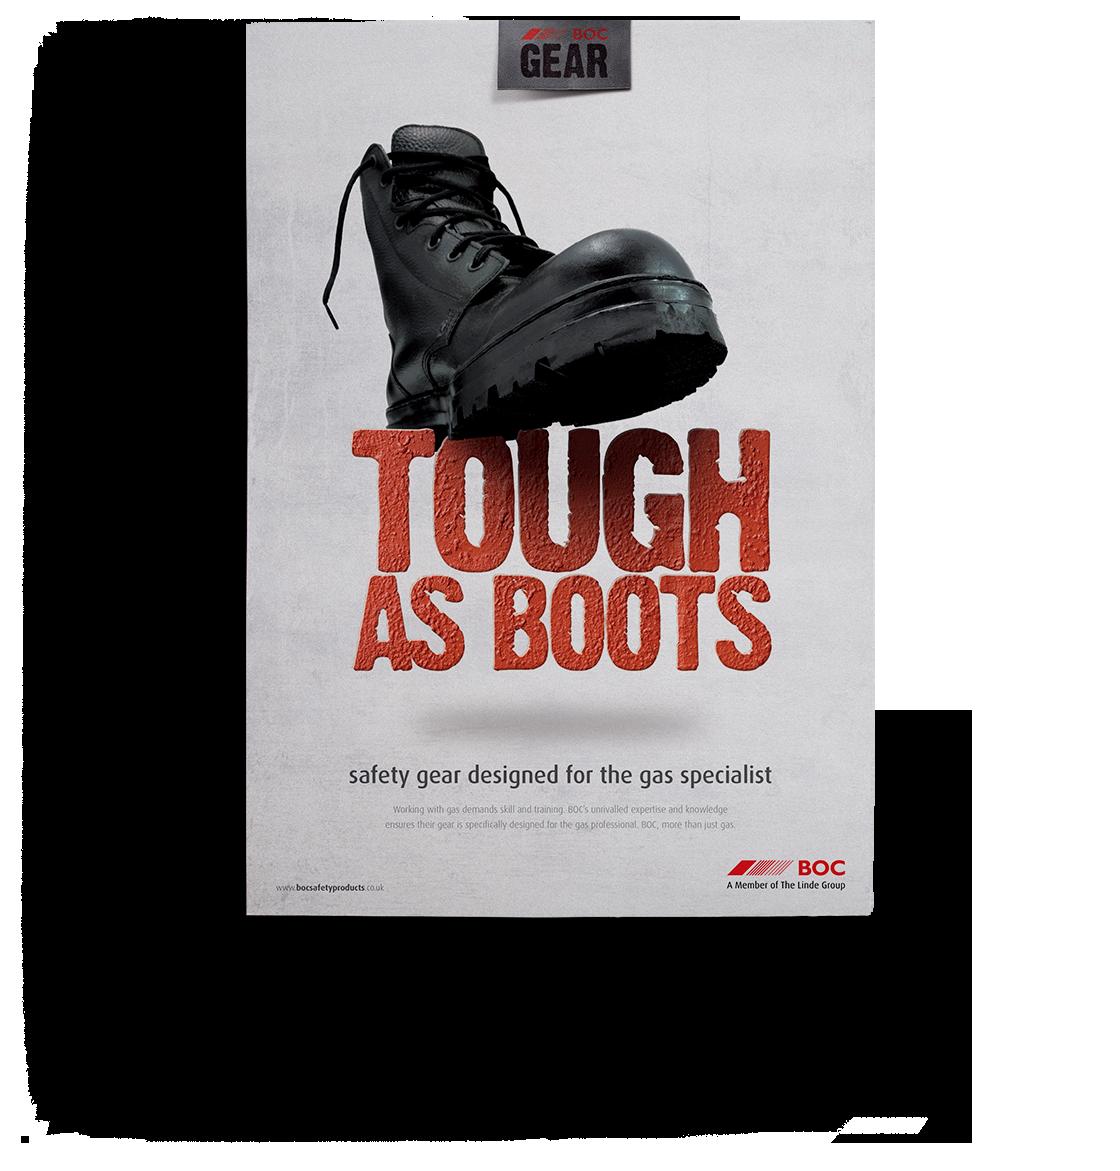 BOC tough as boots